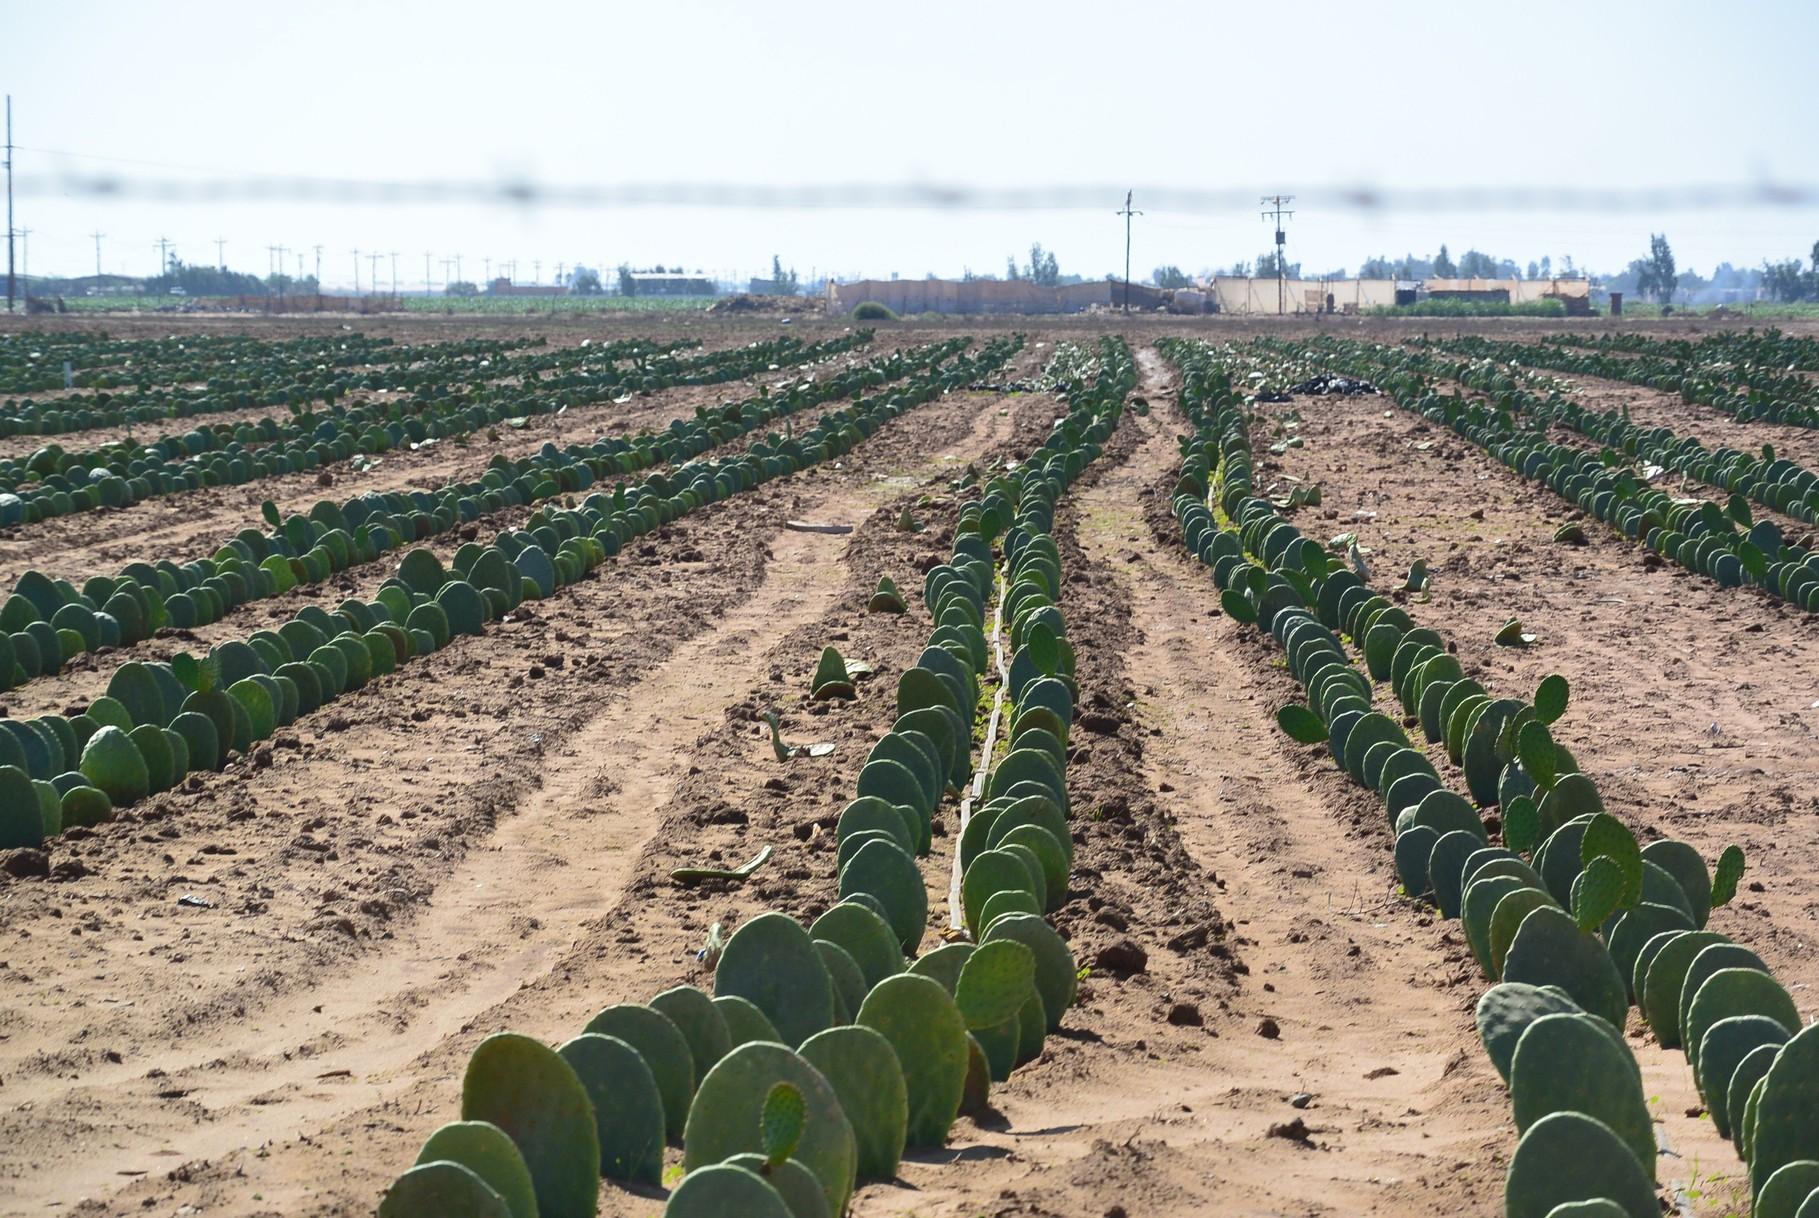 Plantation de cactus comestibles !!